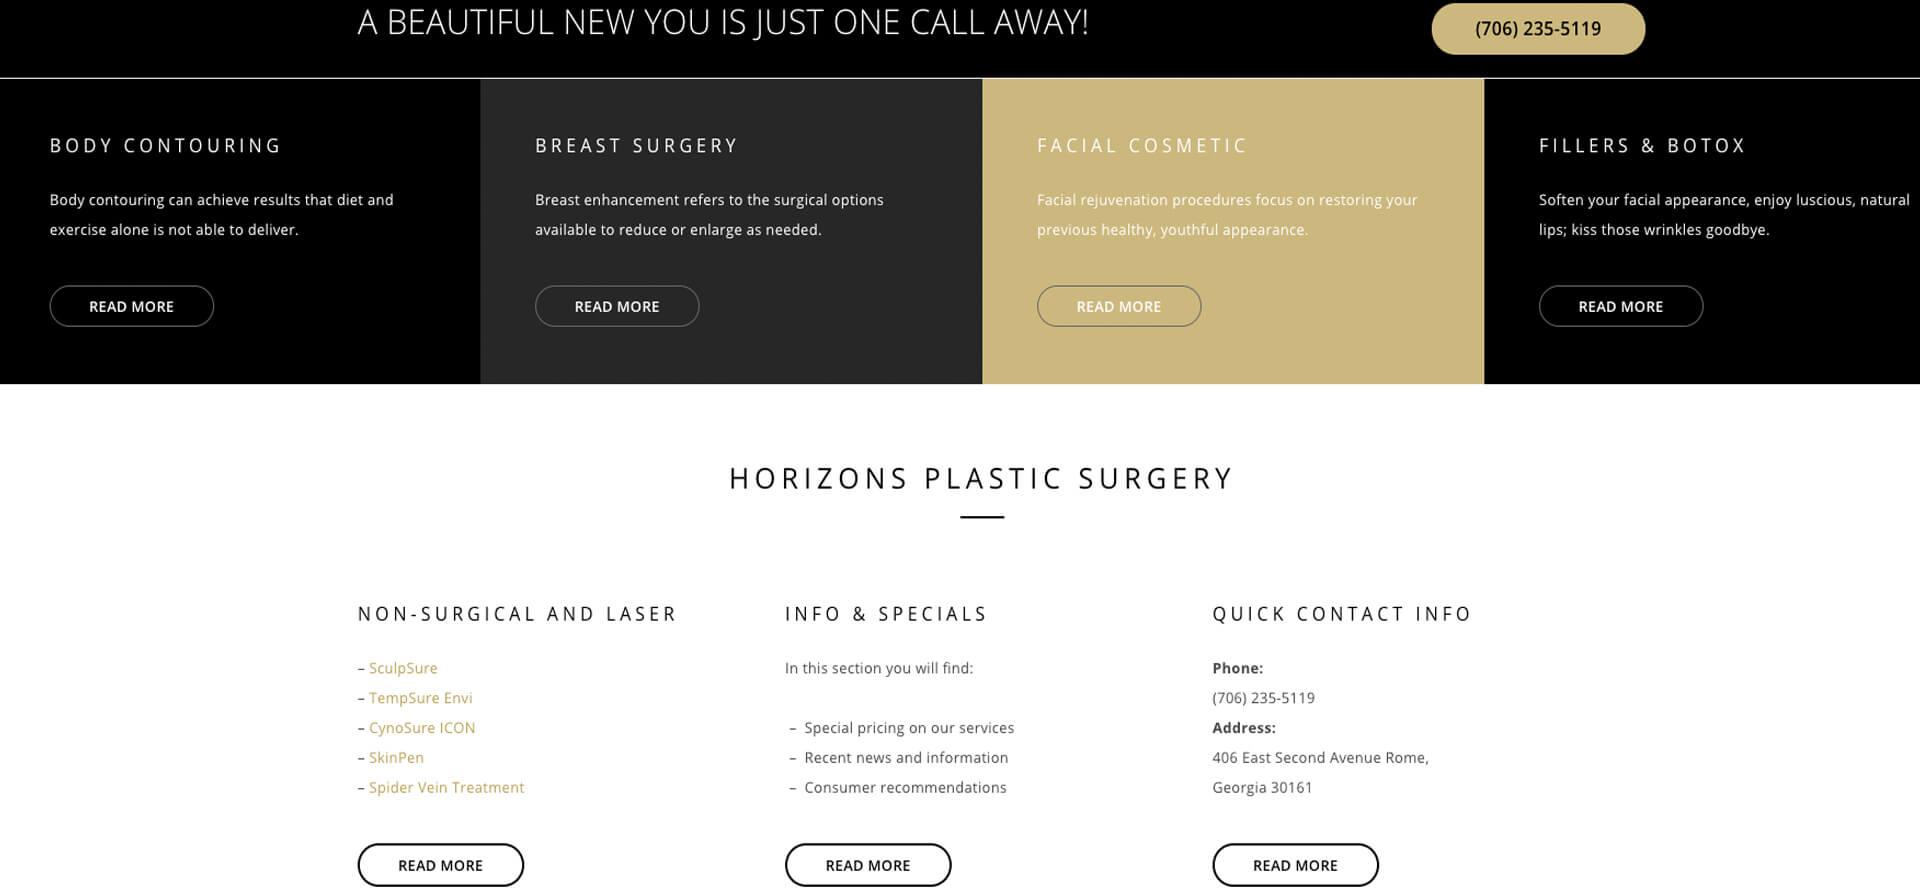 Horizons Plastic Surgery